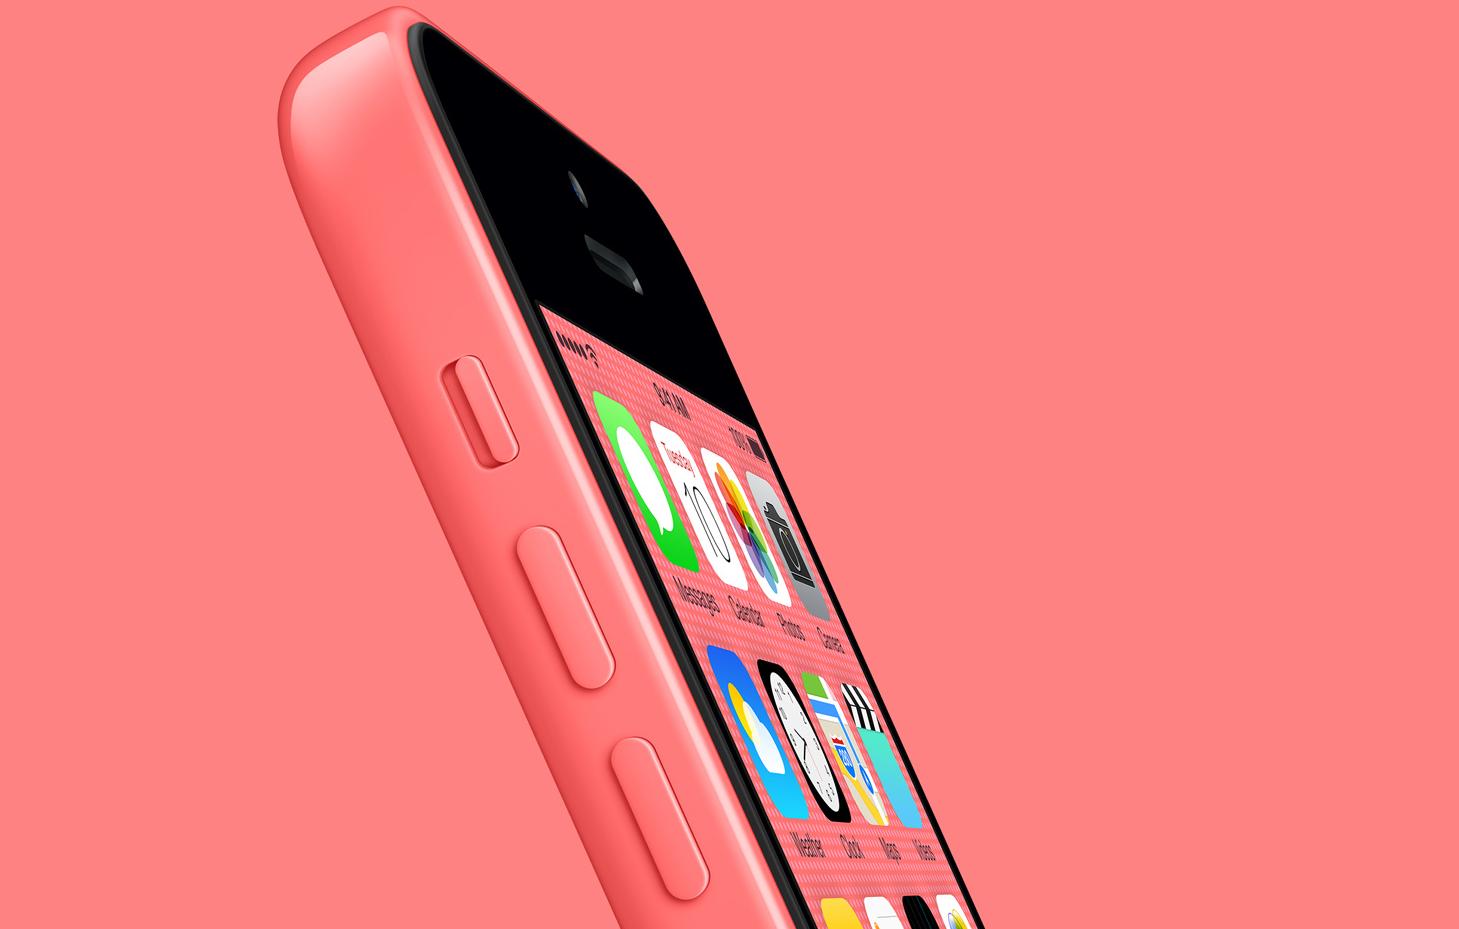 Apple iPhone 5C 16GB Pink 1459x929